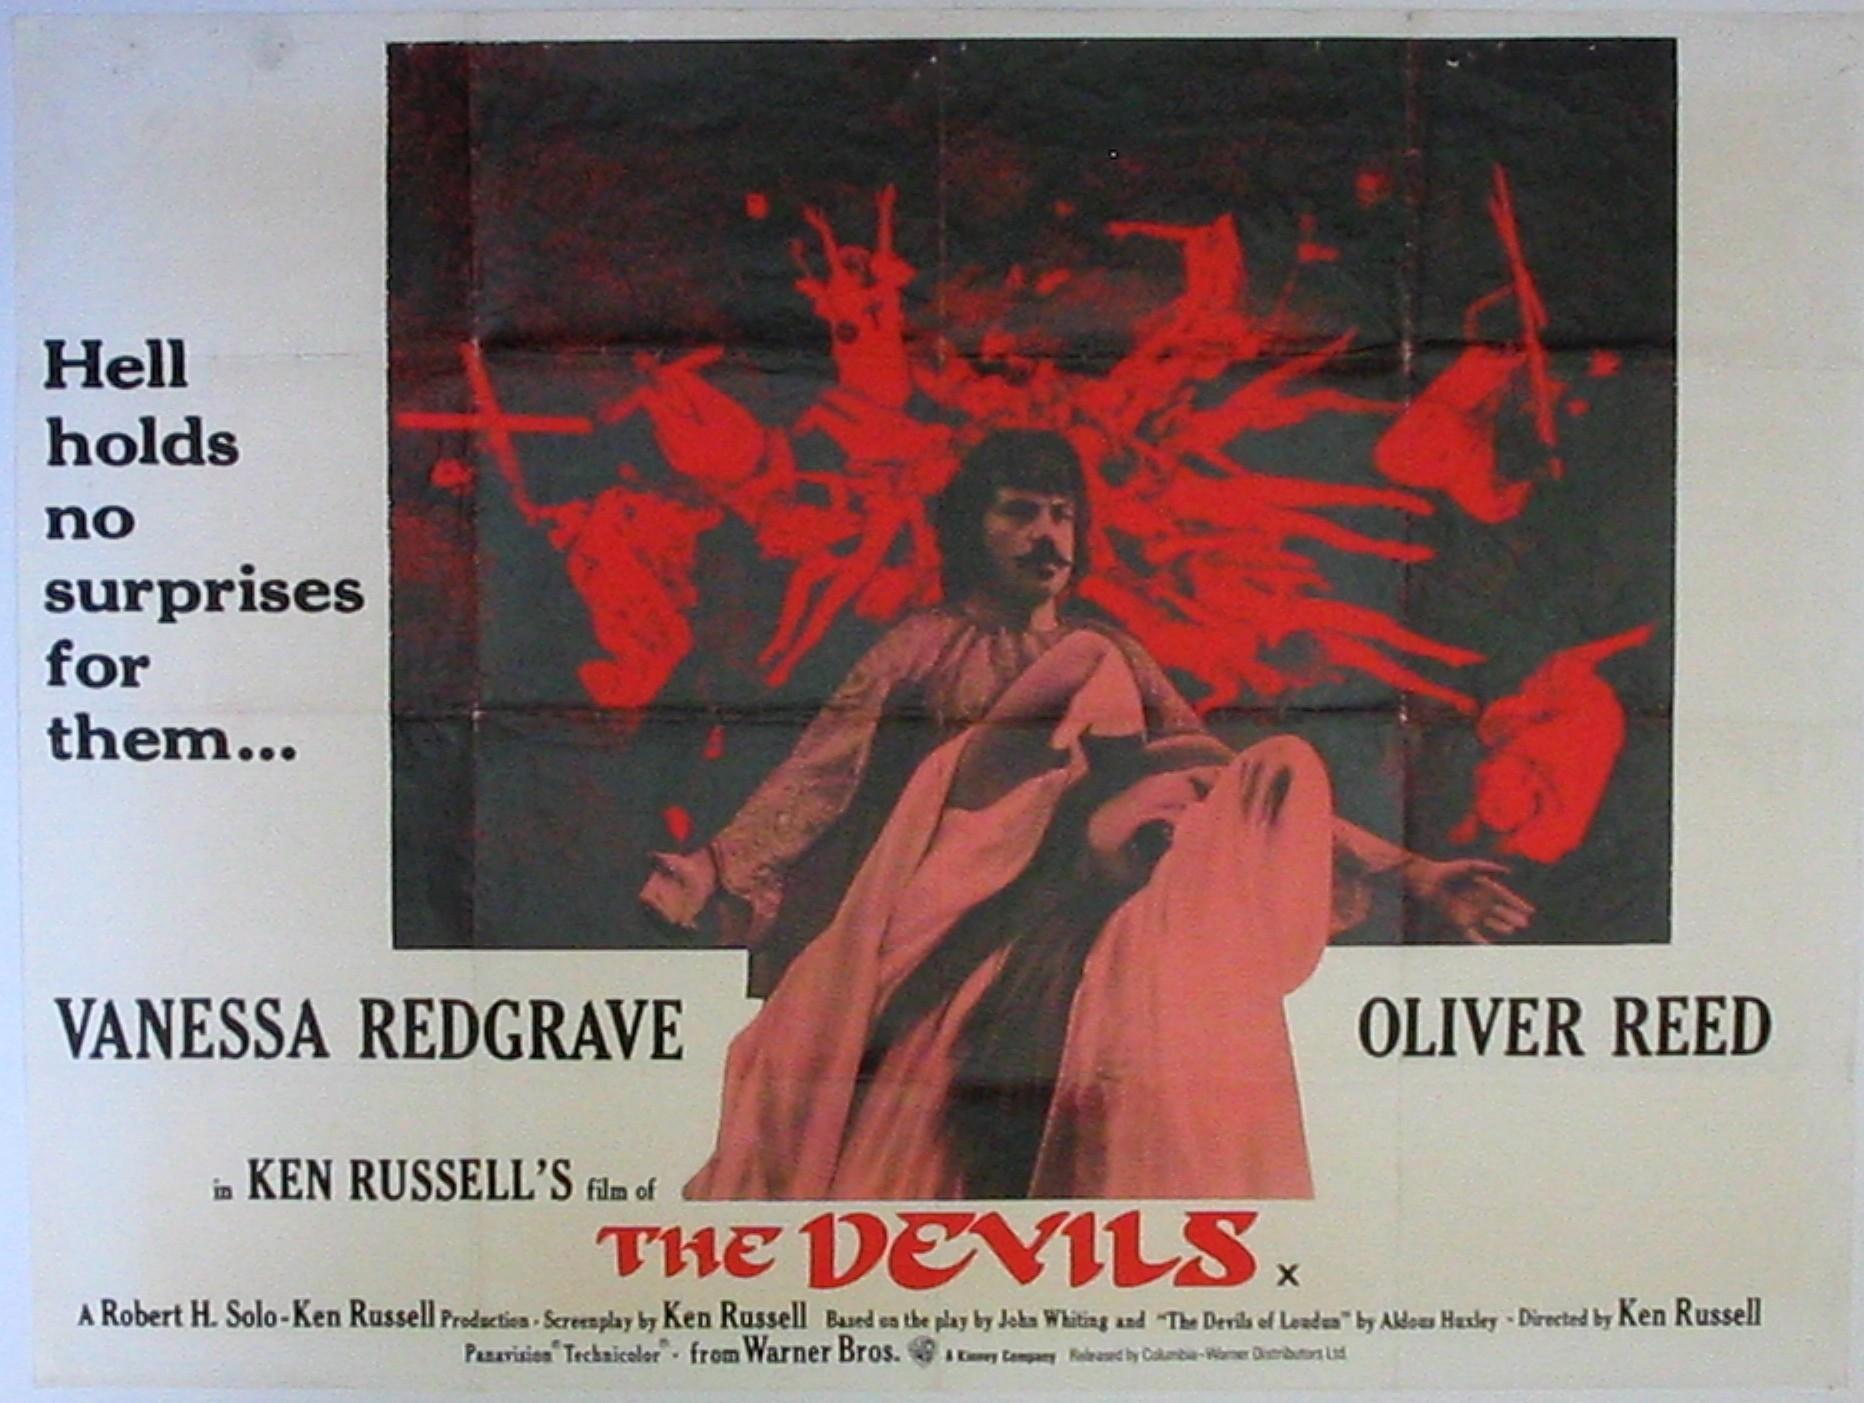 THE-DEVILS1.jpg (1864×1403)